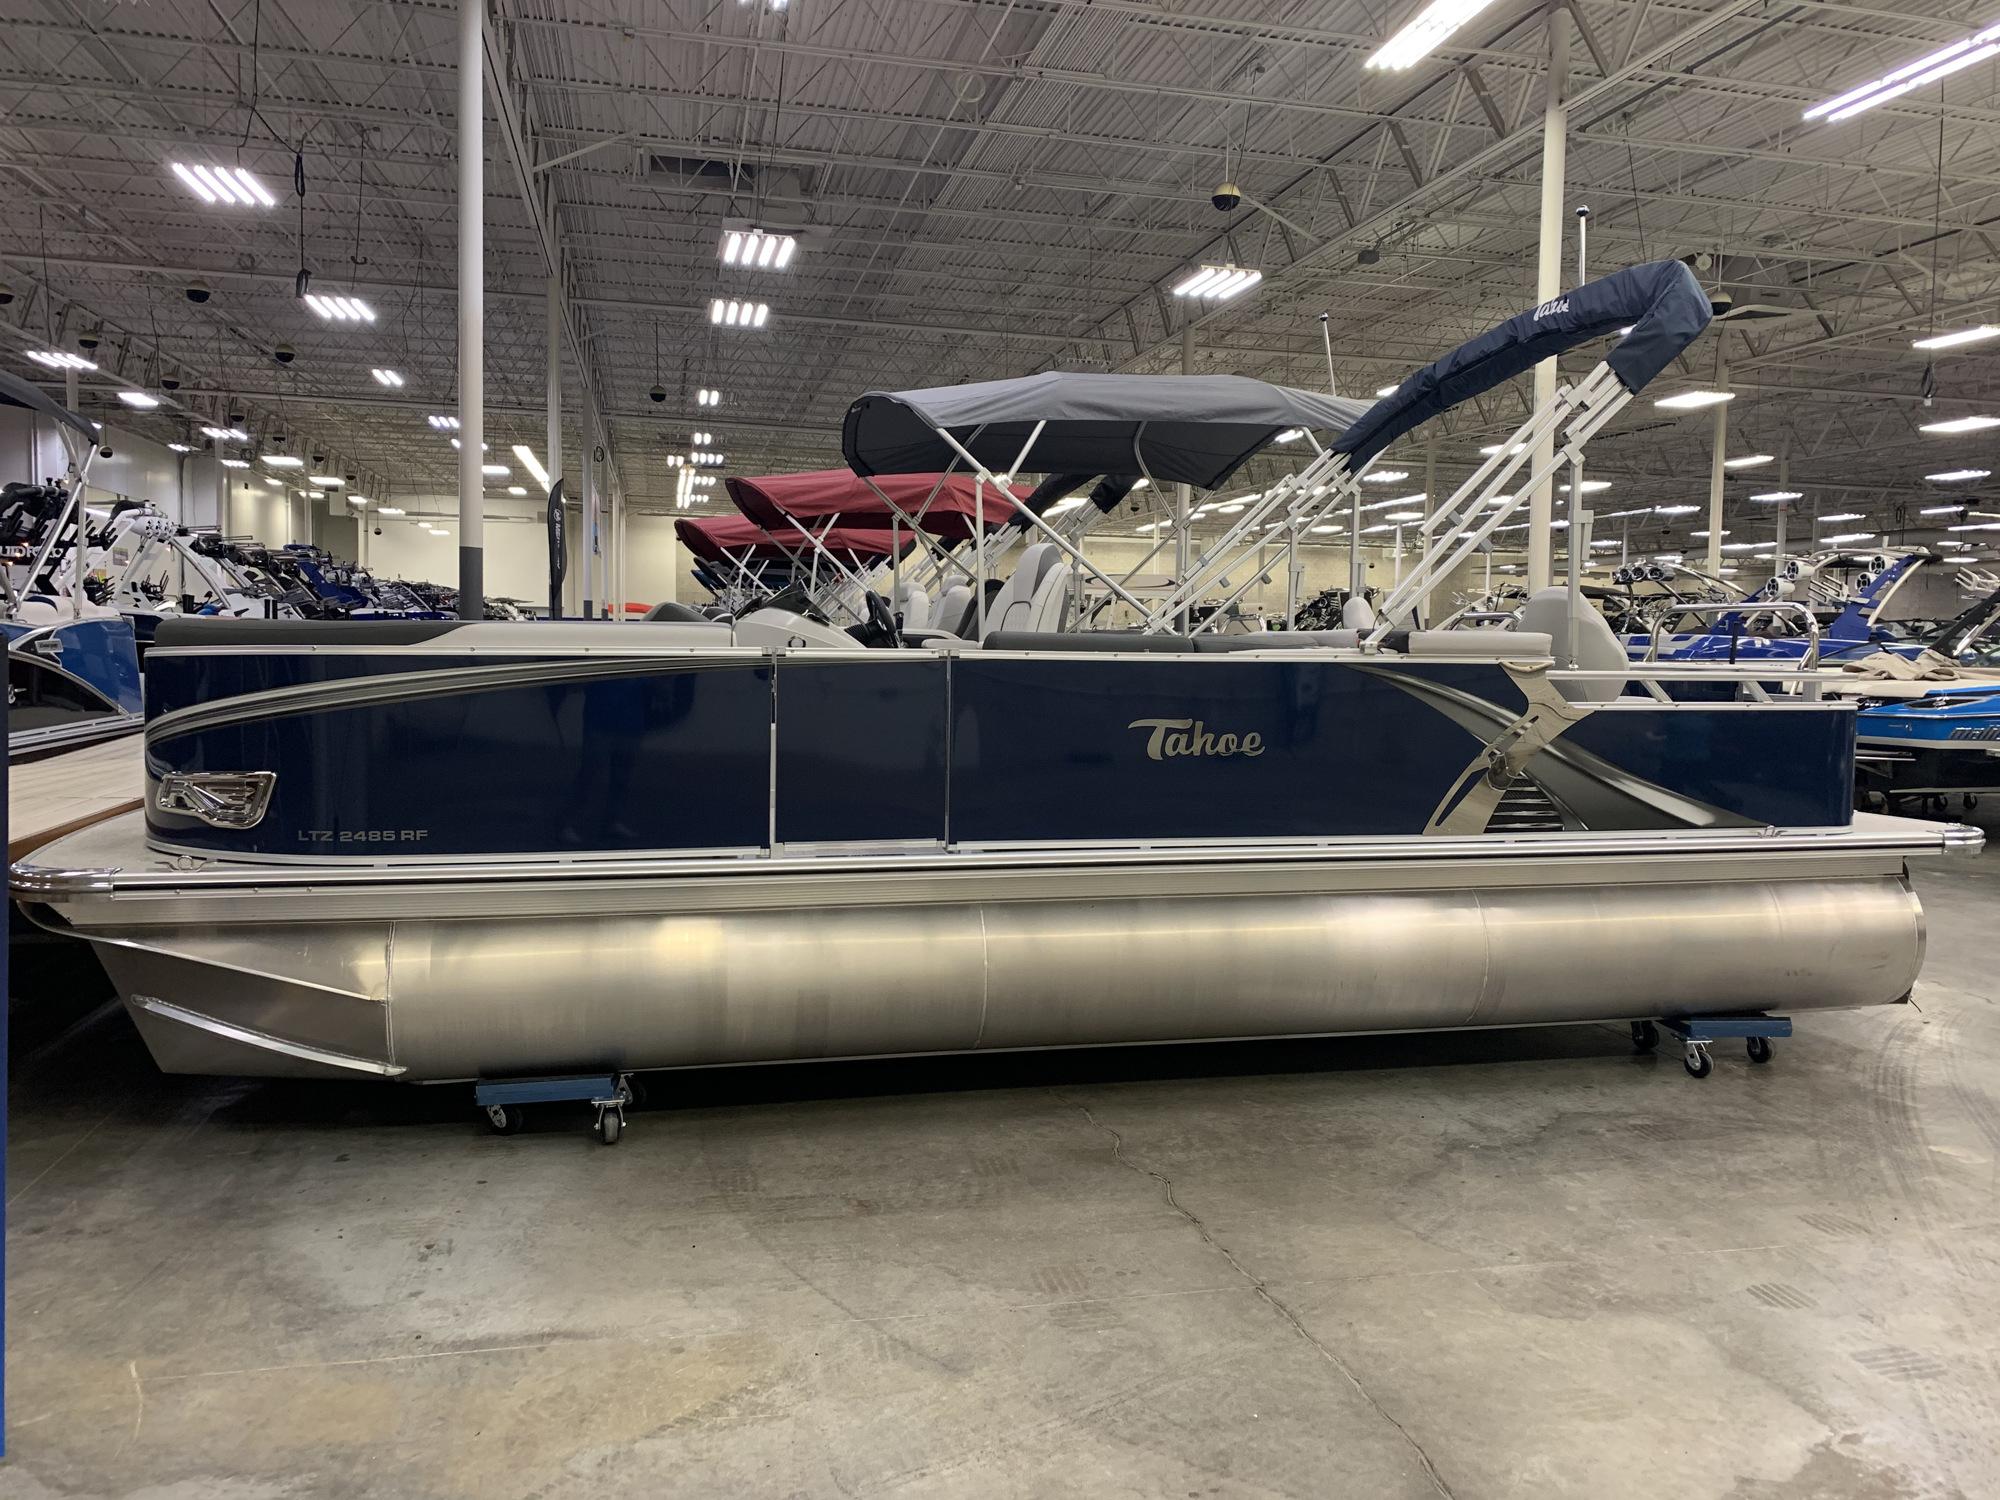 2021 Tahoe 2485 LTZ Rear Fish